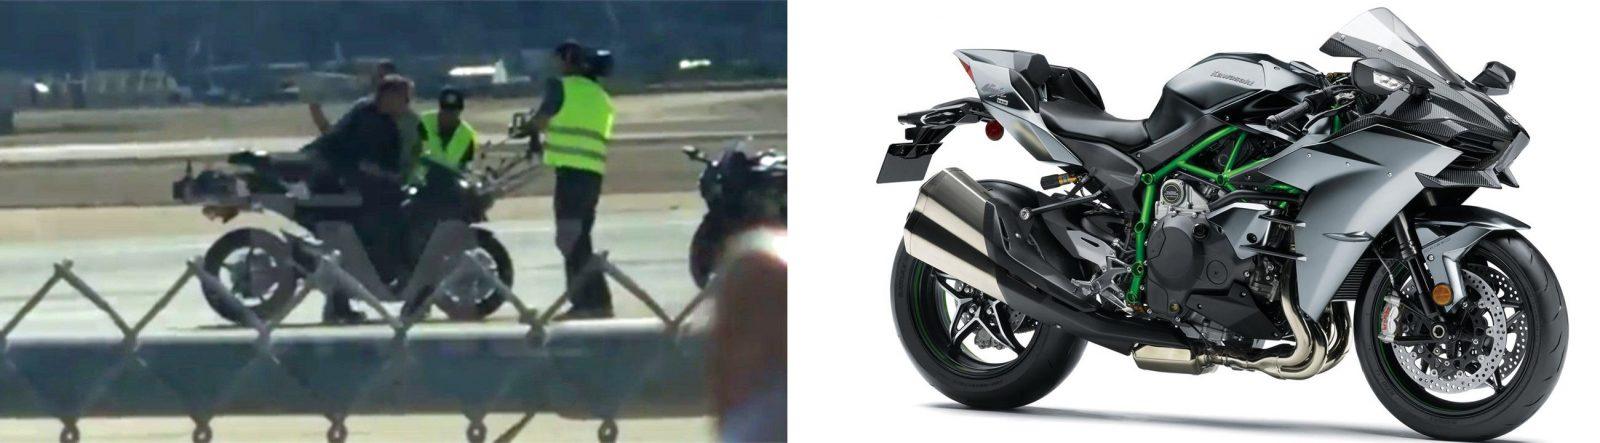 Top Gun Sequel: In-Flight Emergency & Tom Cruise's New Motorcycle